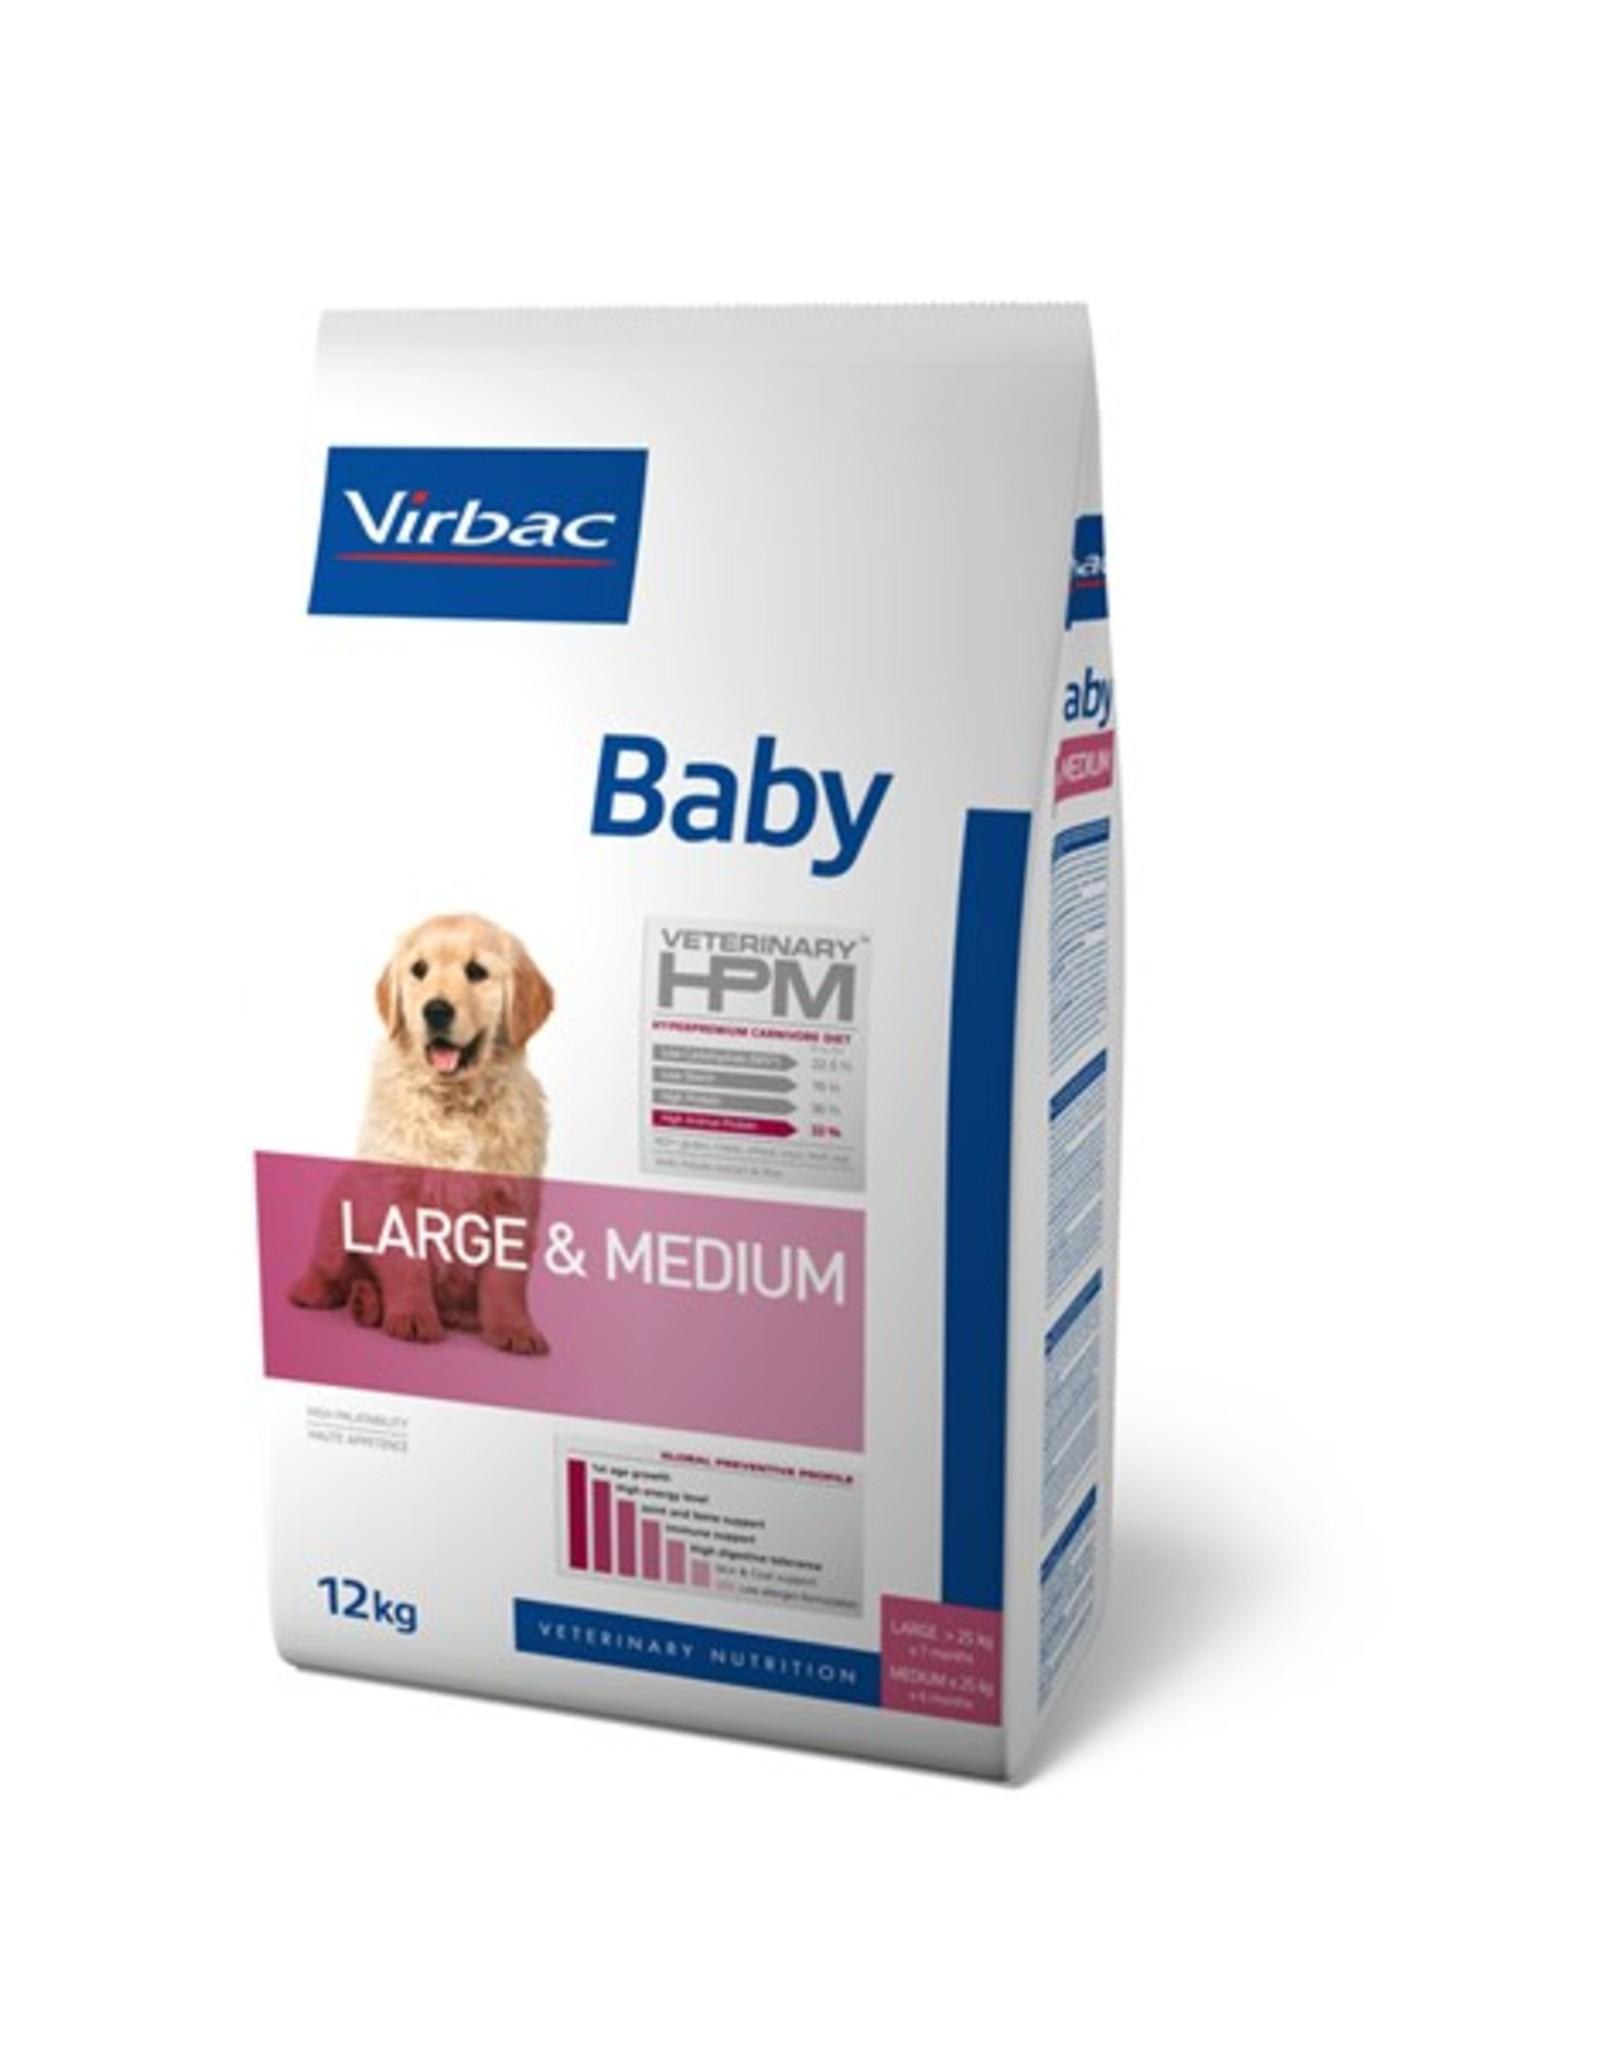 Virbac Virbac Hpm Chien Baby Large/medium Breed 12kg